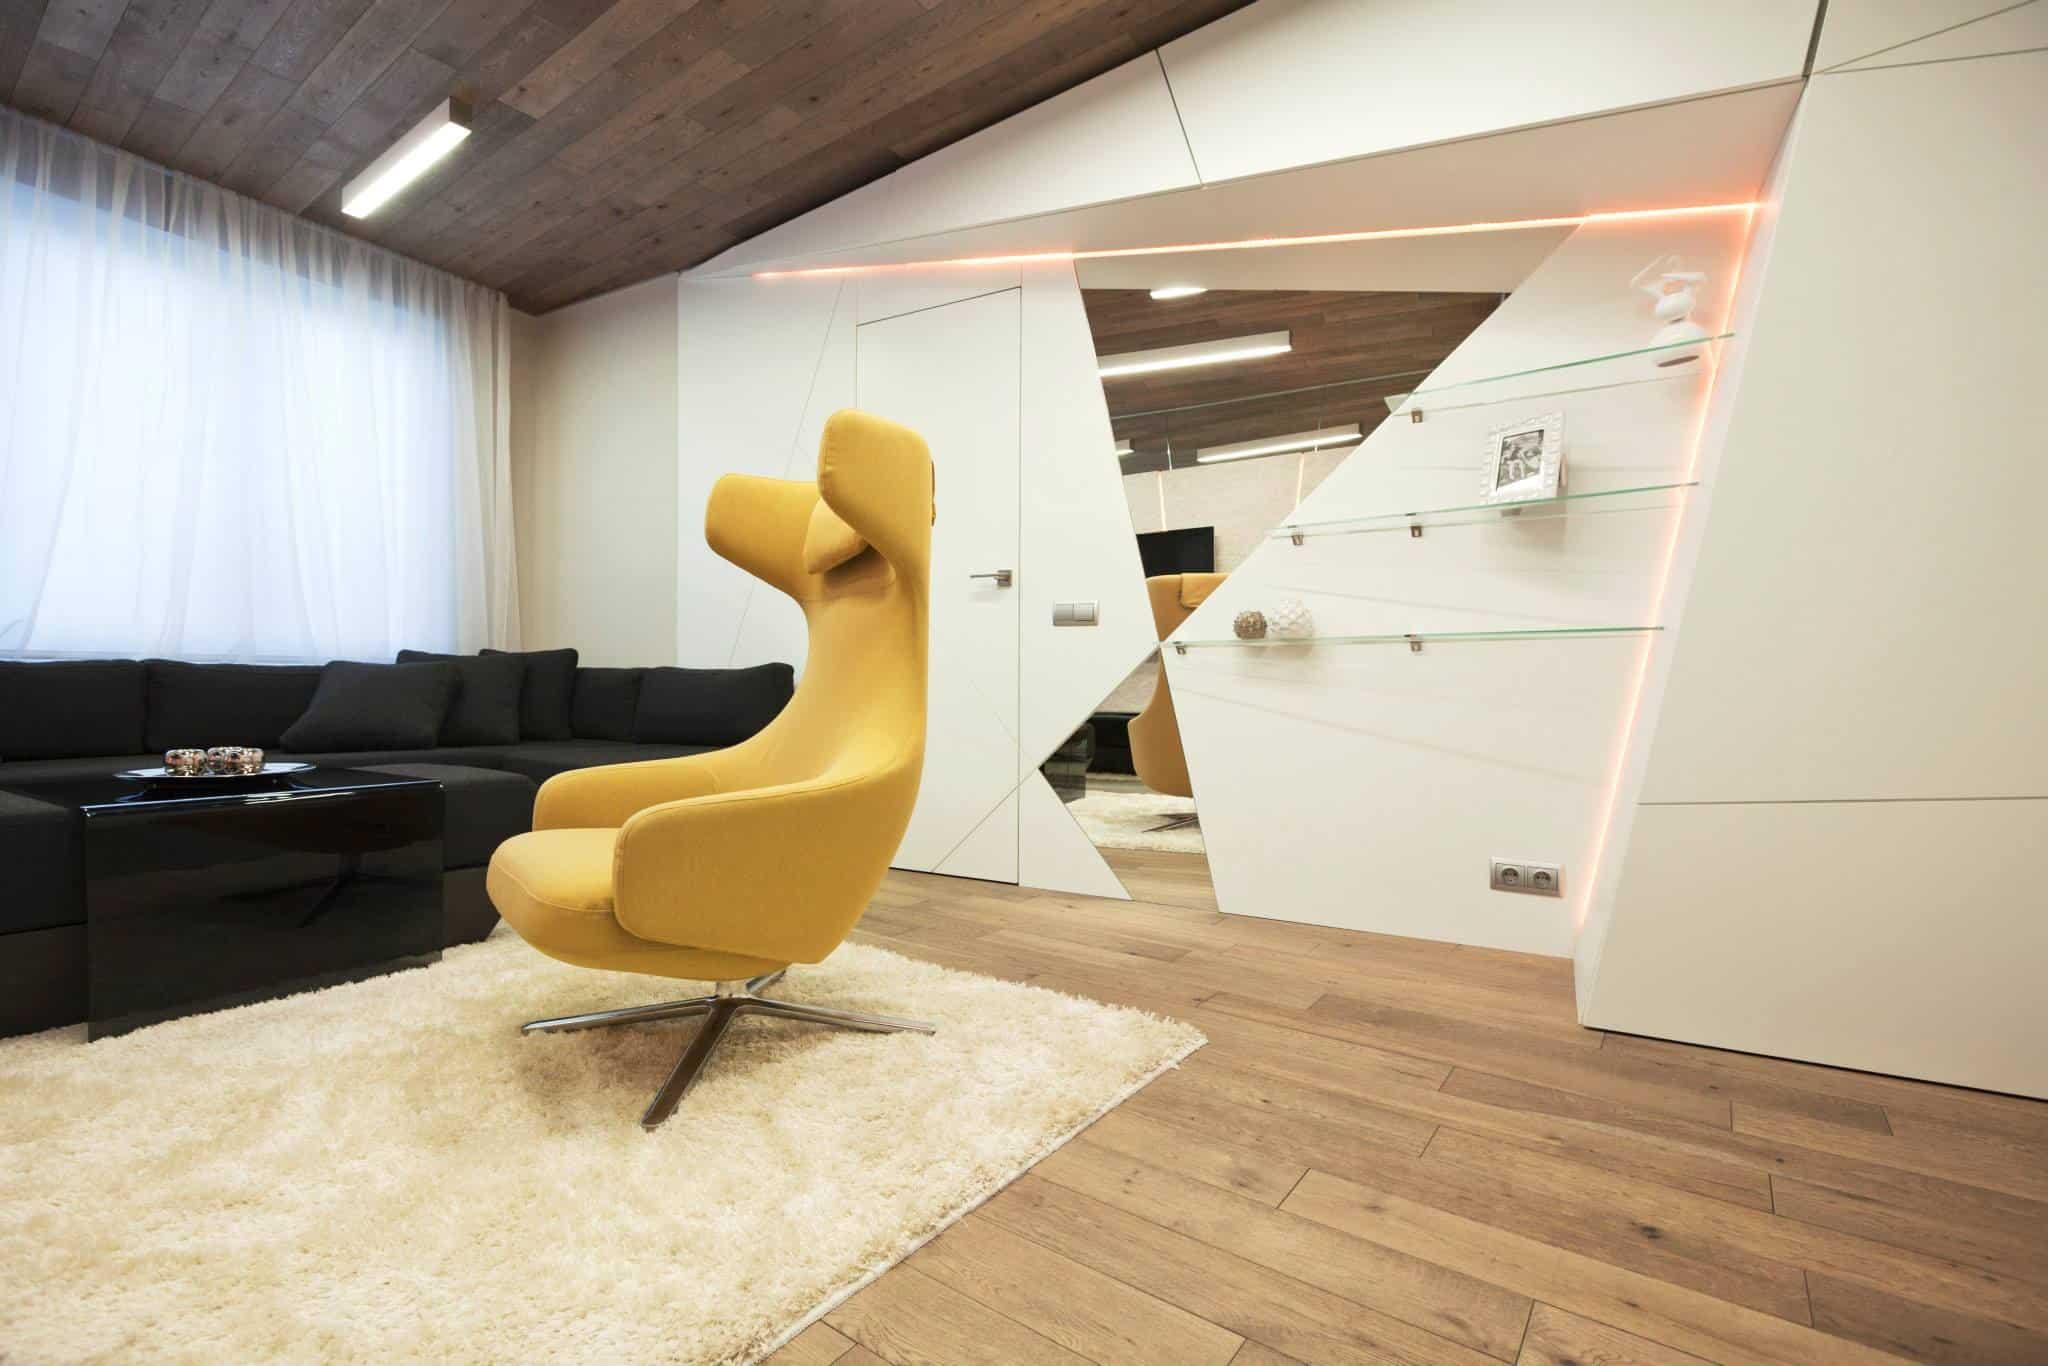 Parametrium Of Contrasts Miroshkin Michael Miroshkina Elen By Geometrix Design Amazing TV Room By Geometrix Design 8679 2